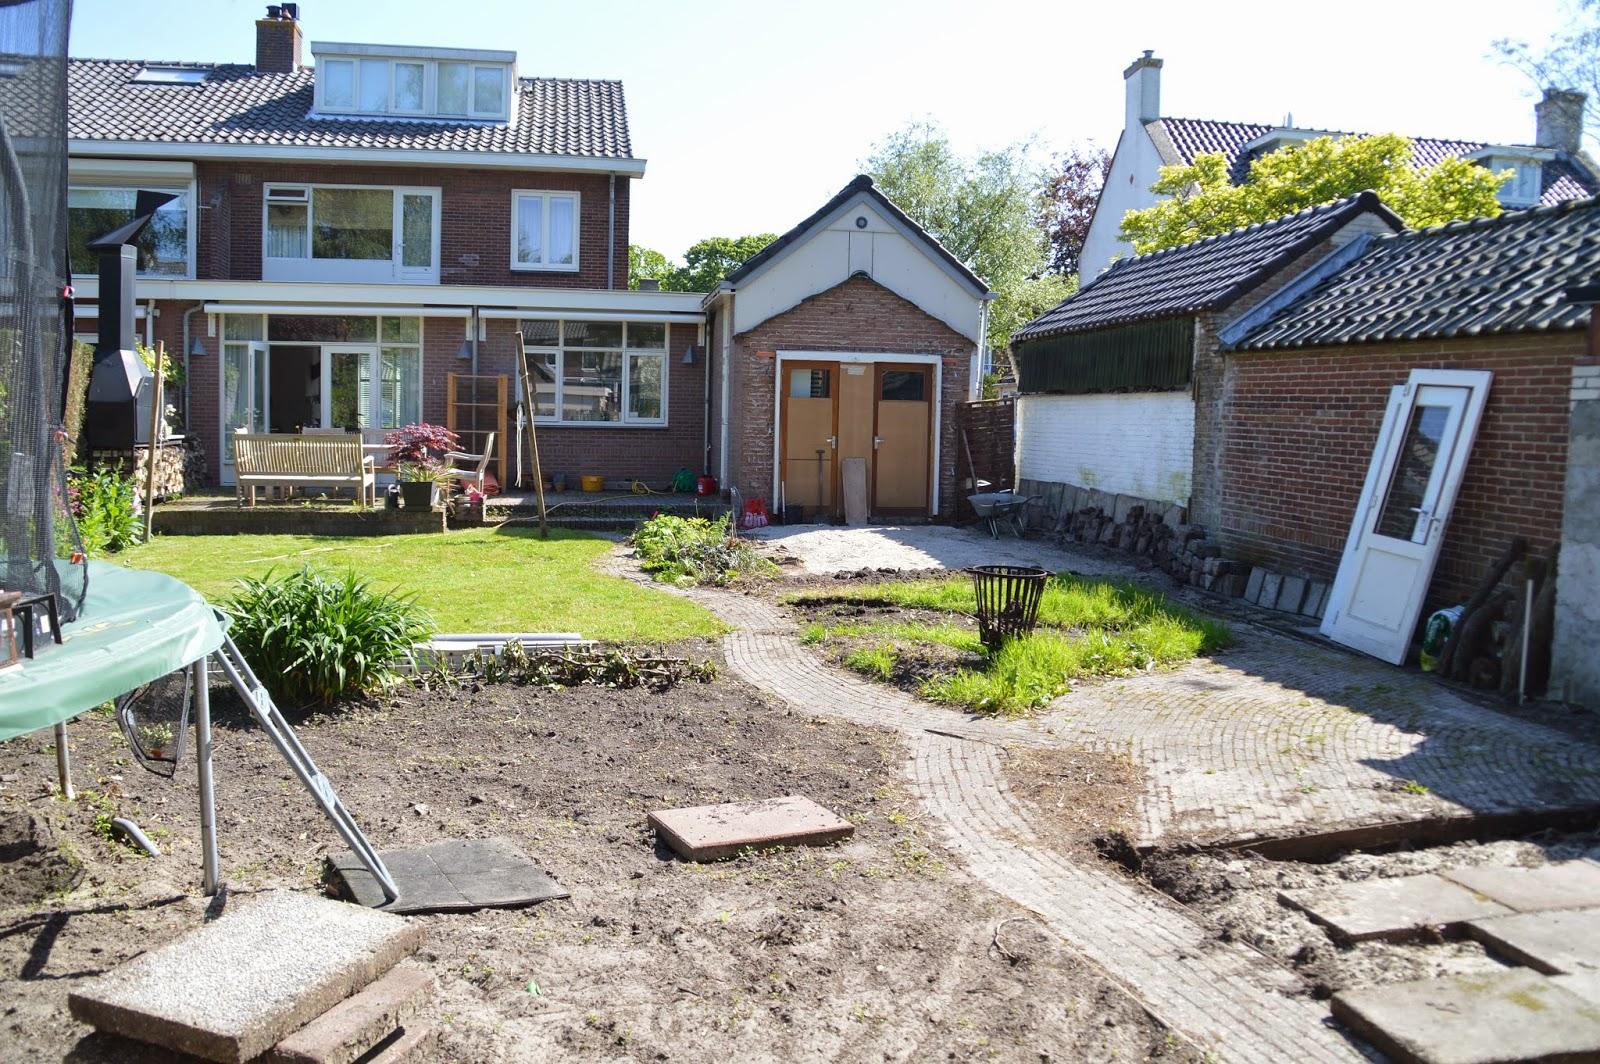 The renovation part for 14 m4s garden terrace